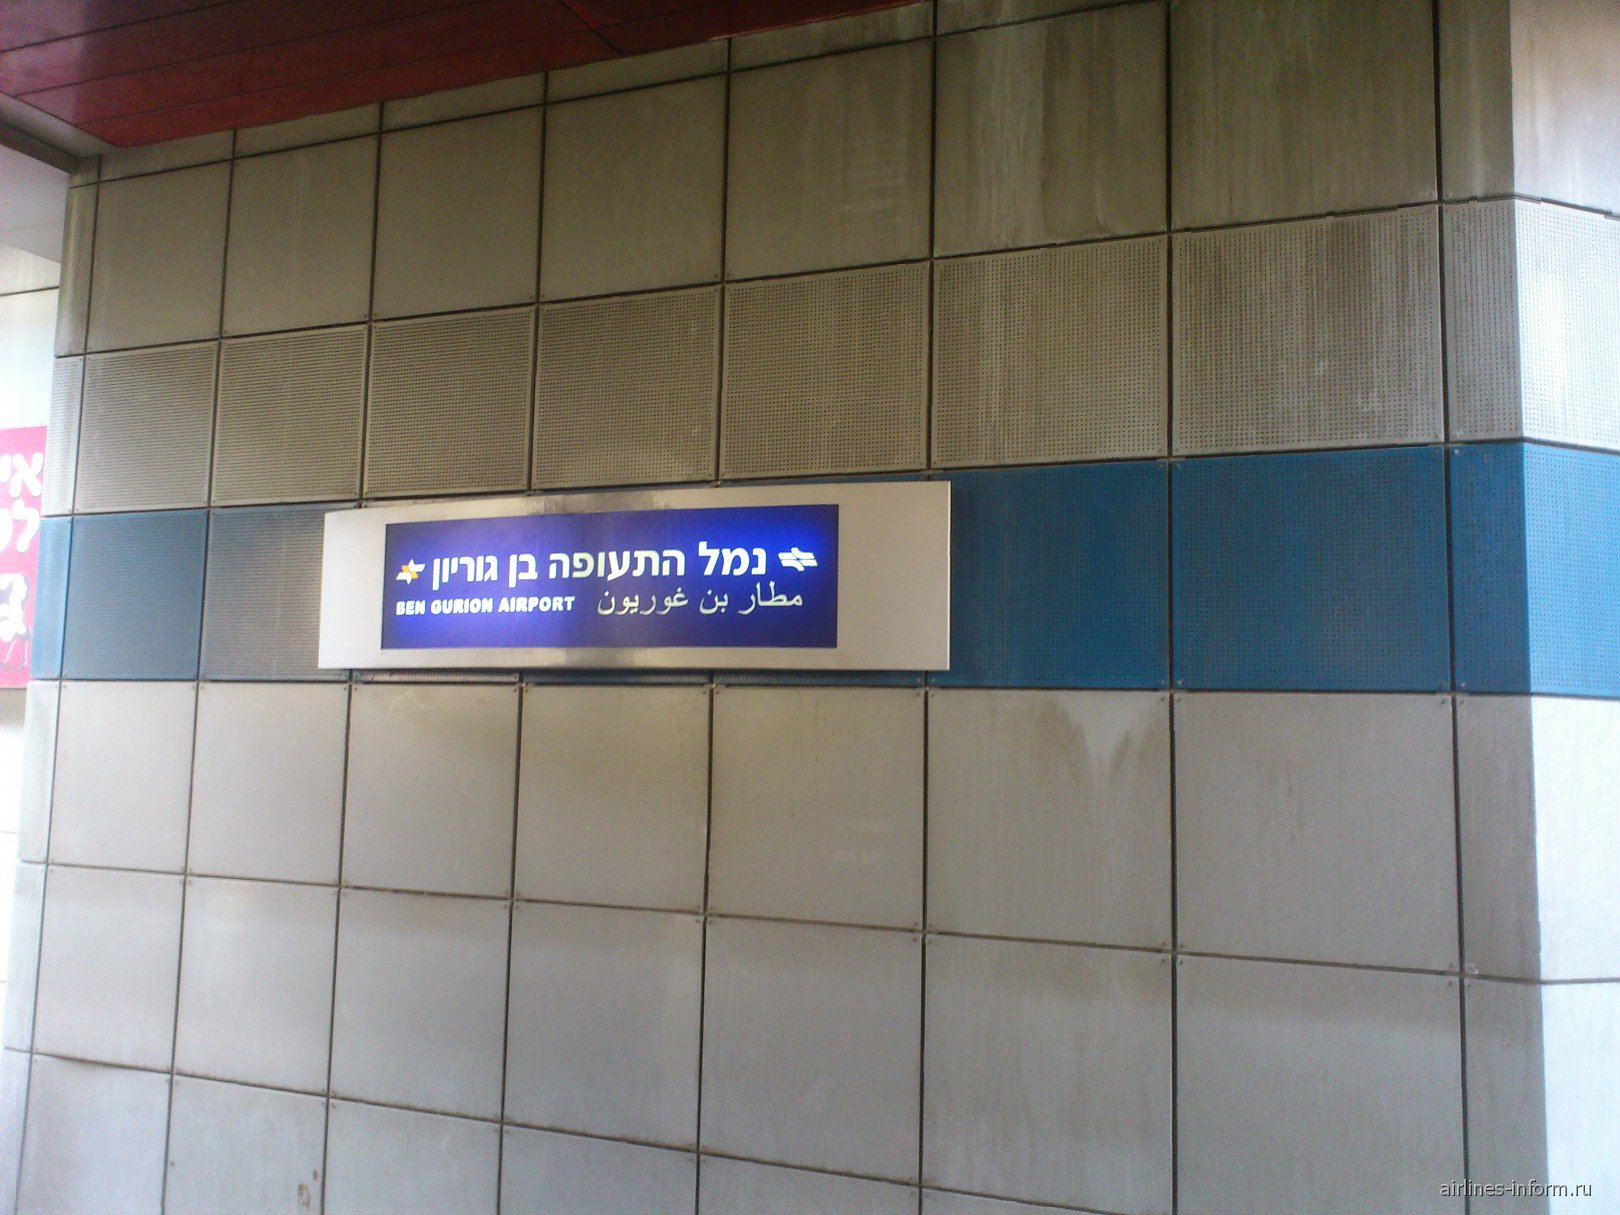 Аэропорт Бен-Гурион в Тель-Авиве